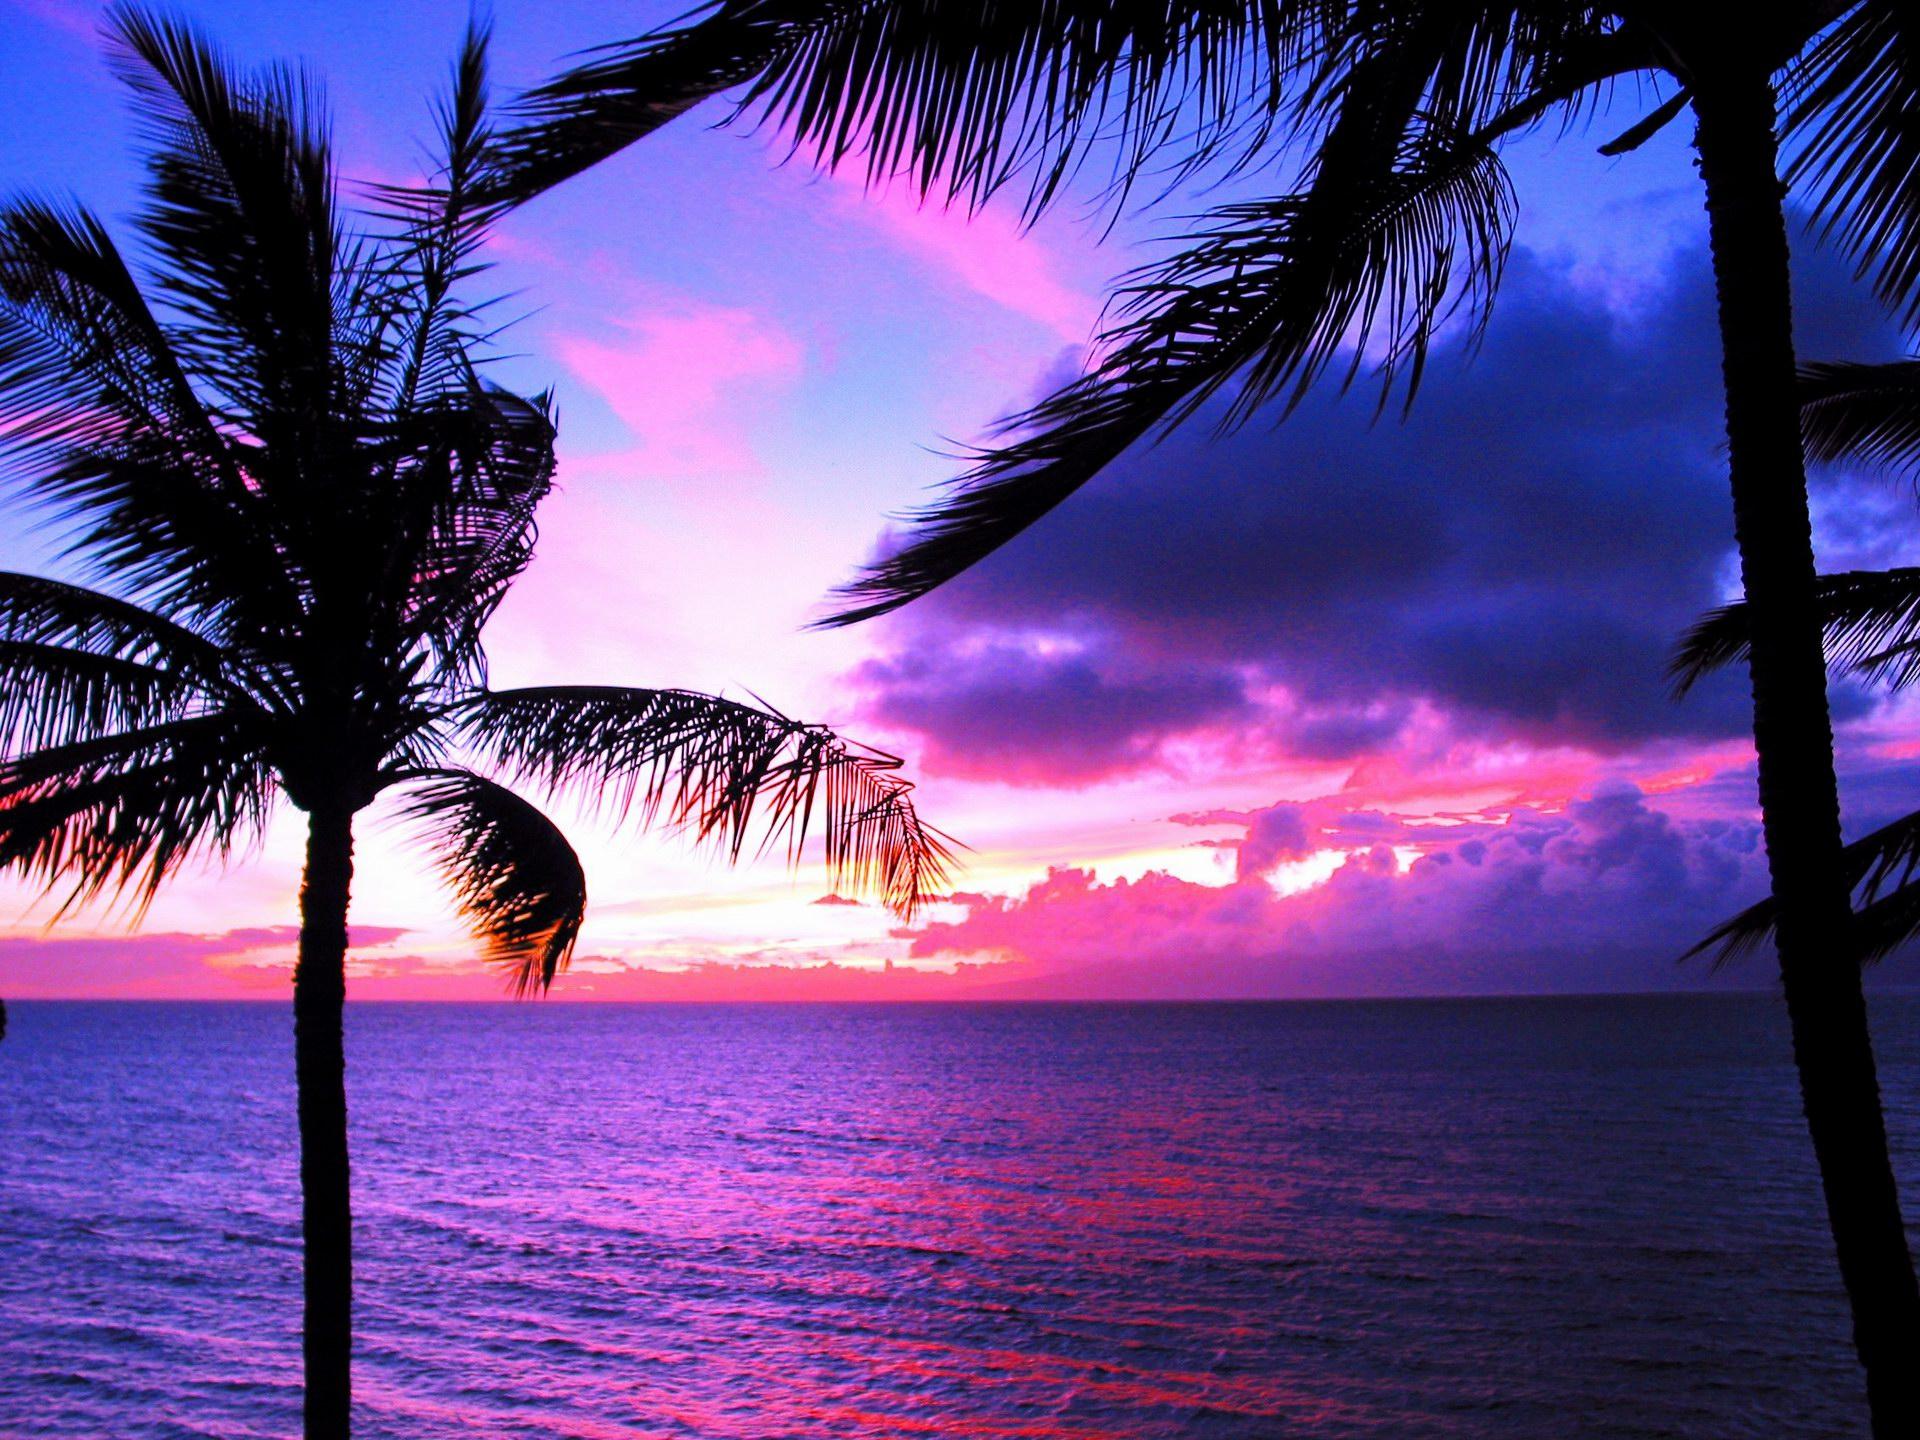 Hawaii 334177 Full HD Widescreen wallpapers for desktop download 1920x1440